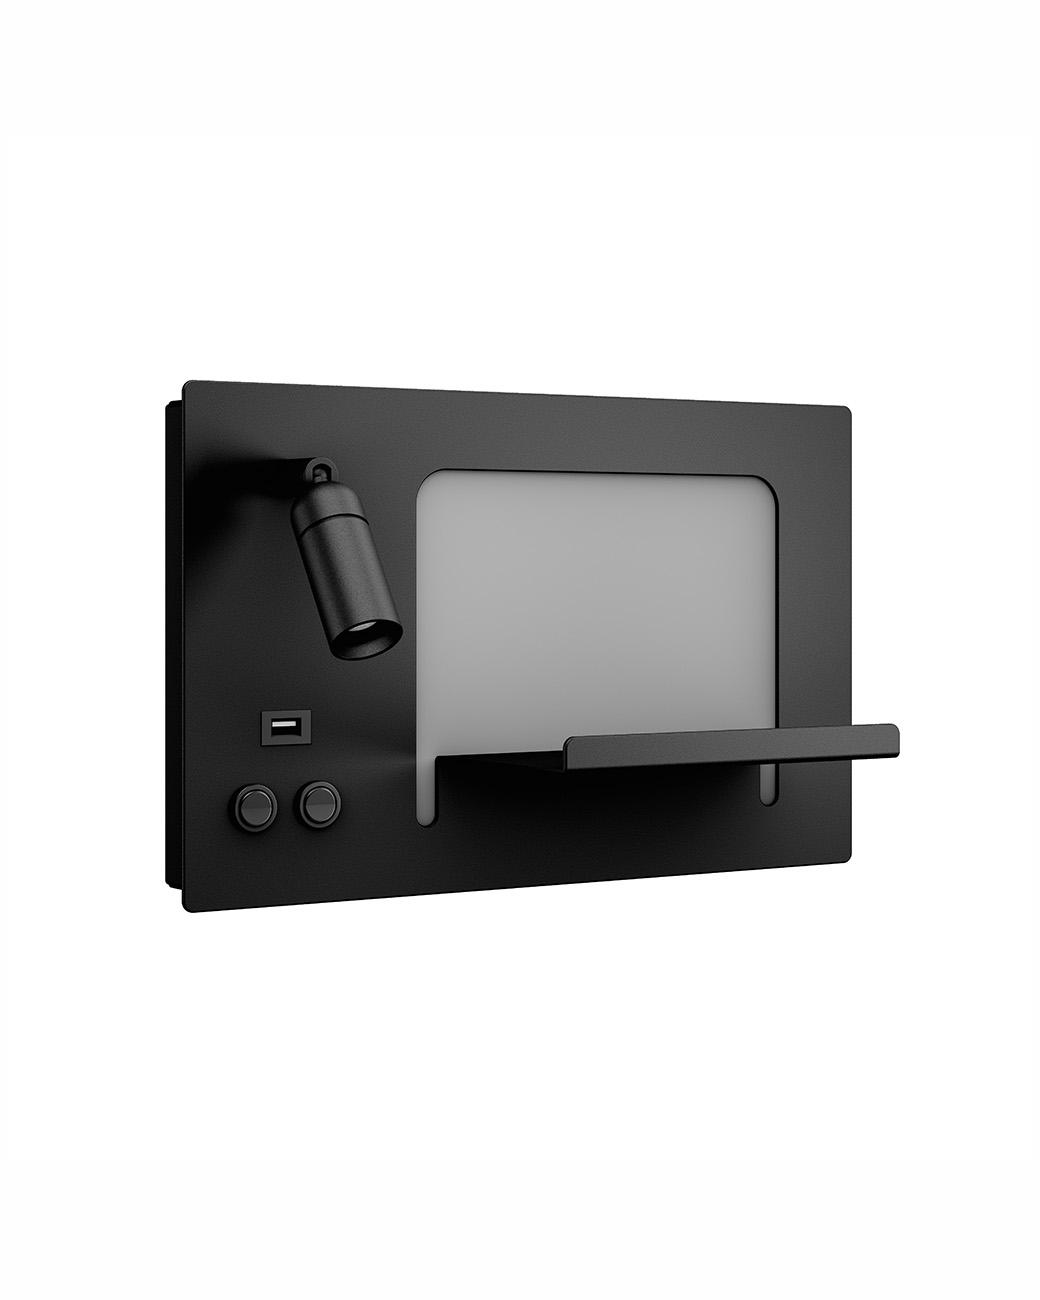 AP-1398 PT - Textured Black